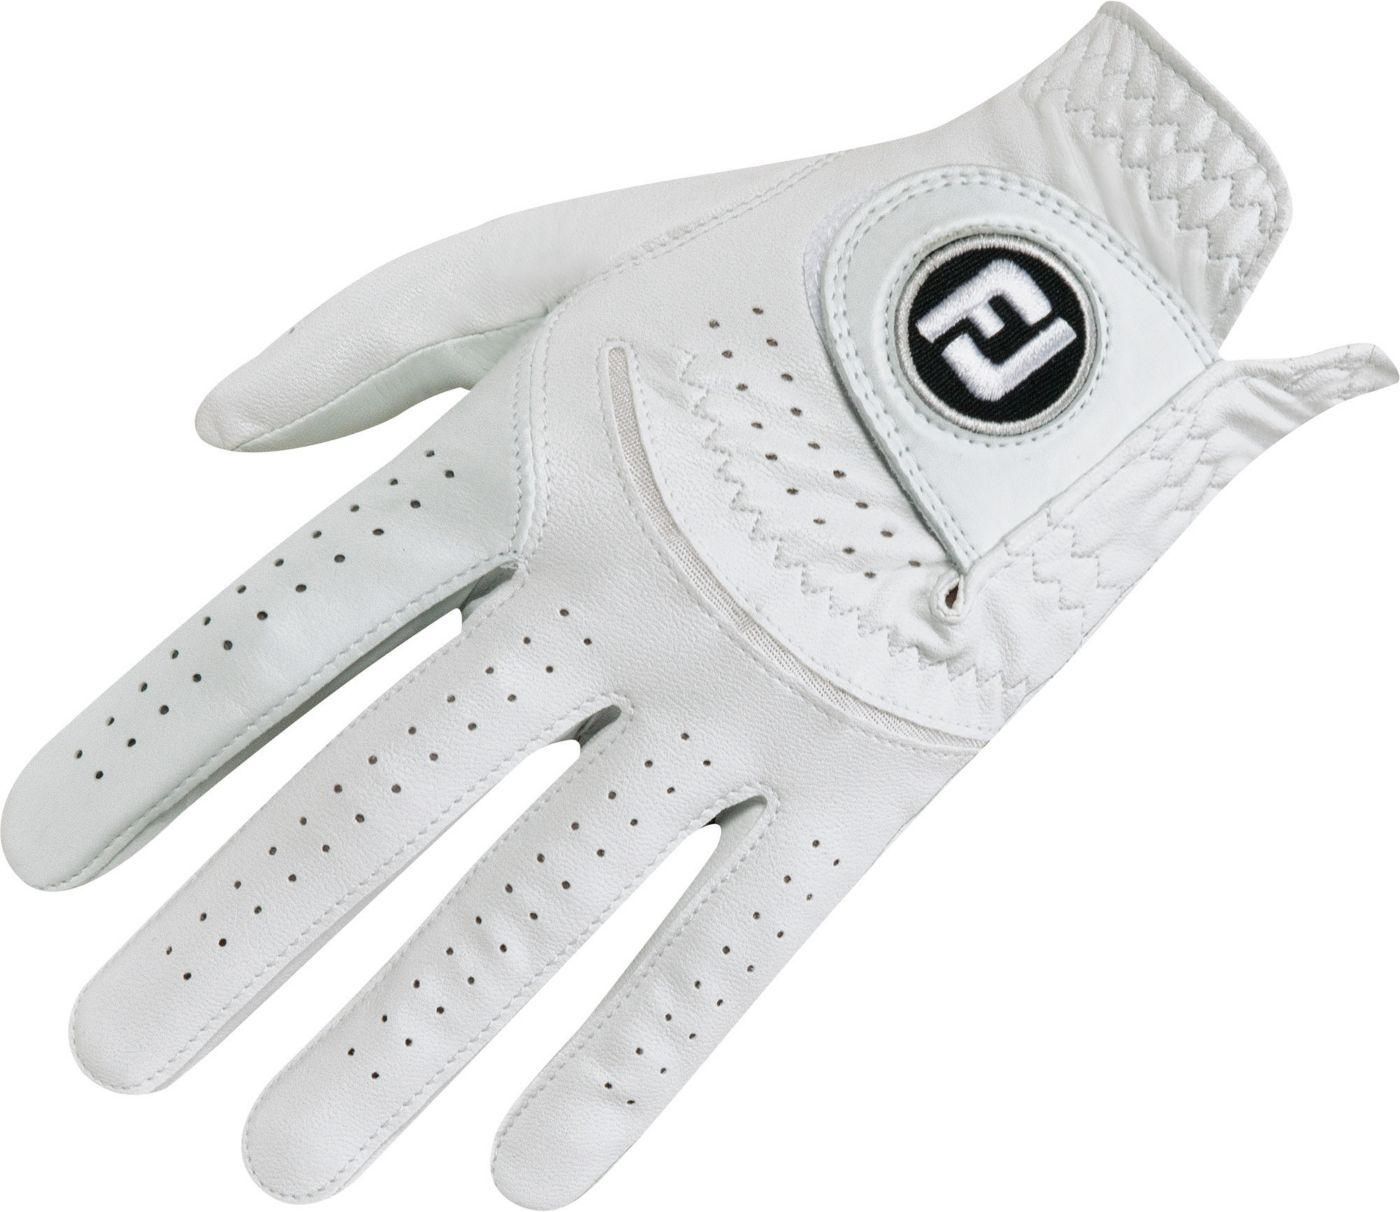 FootJoy Contour FLX Golf Glove- Prior Generation